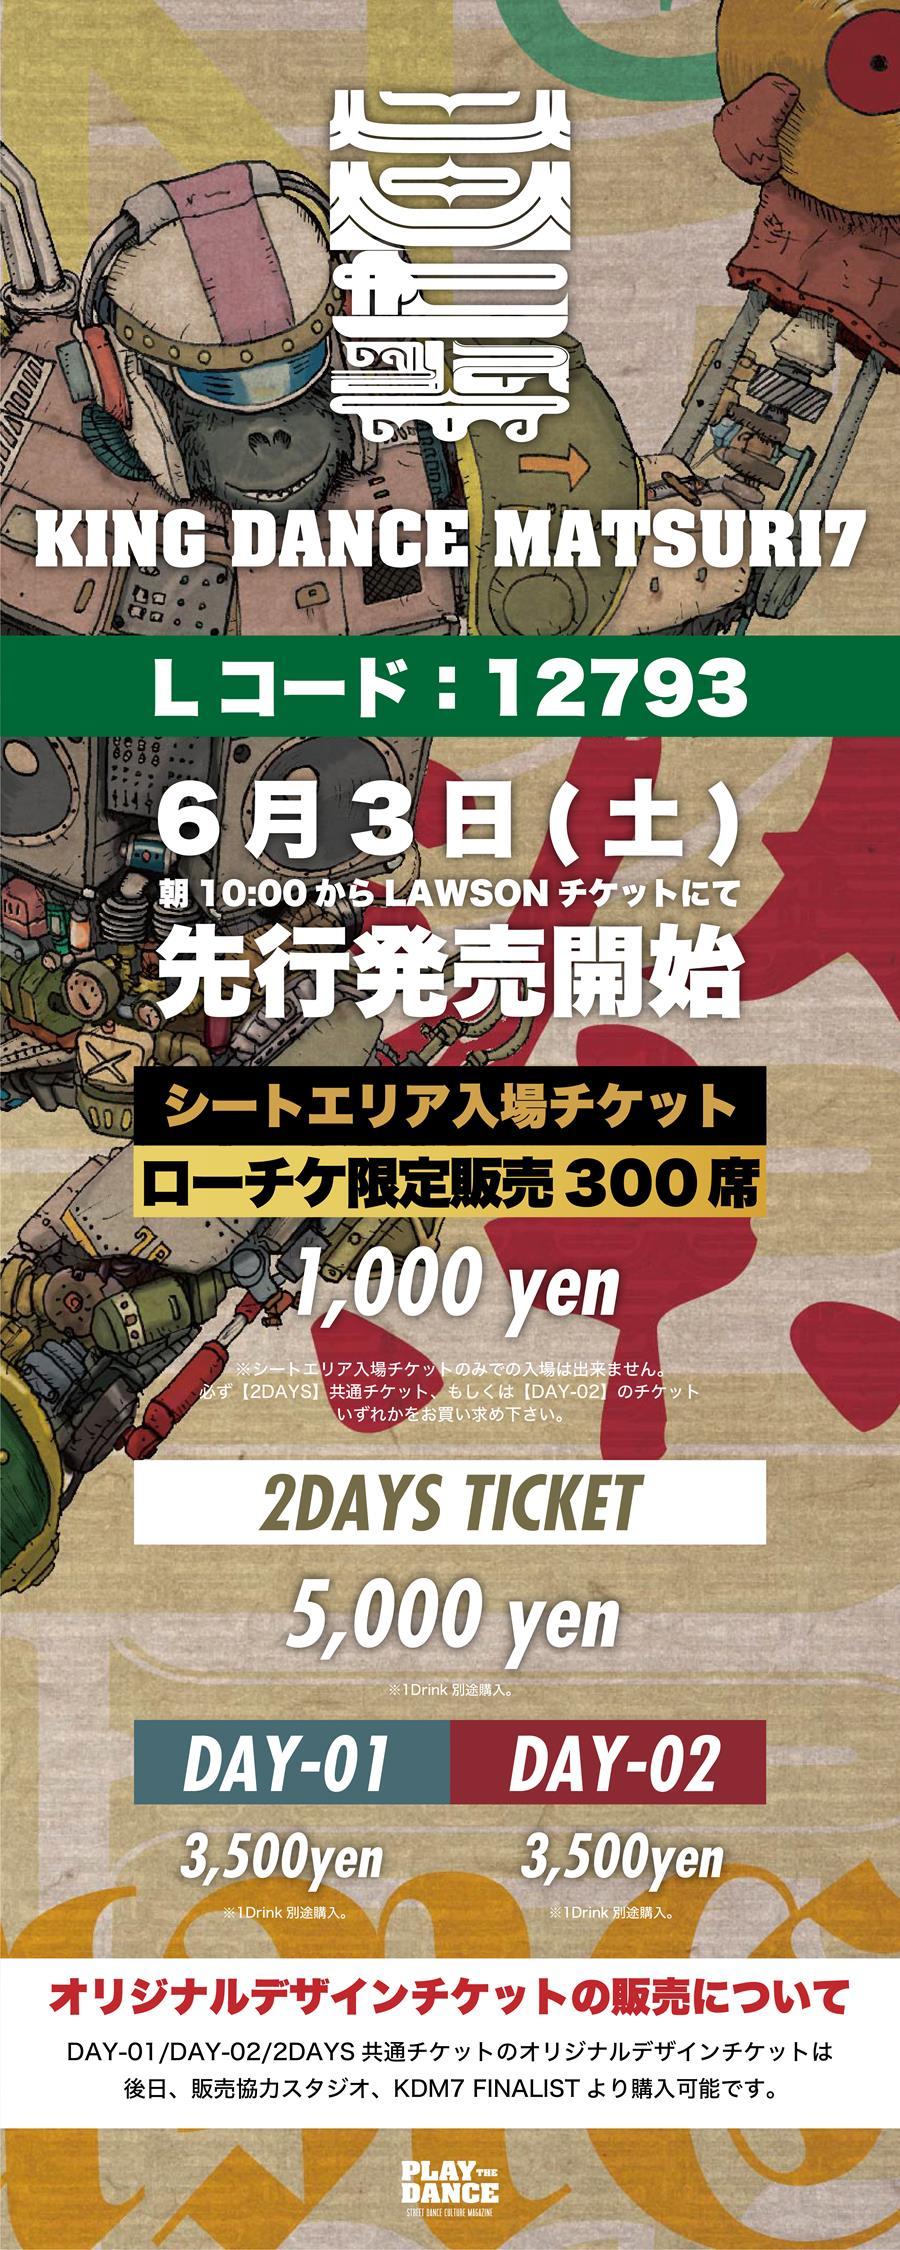 2017_05_30_001-012